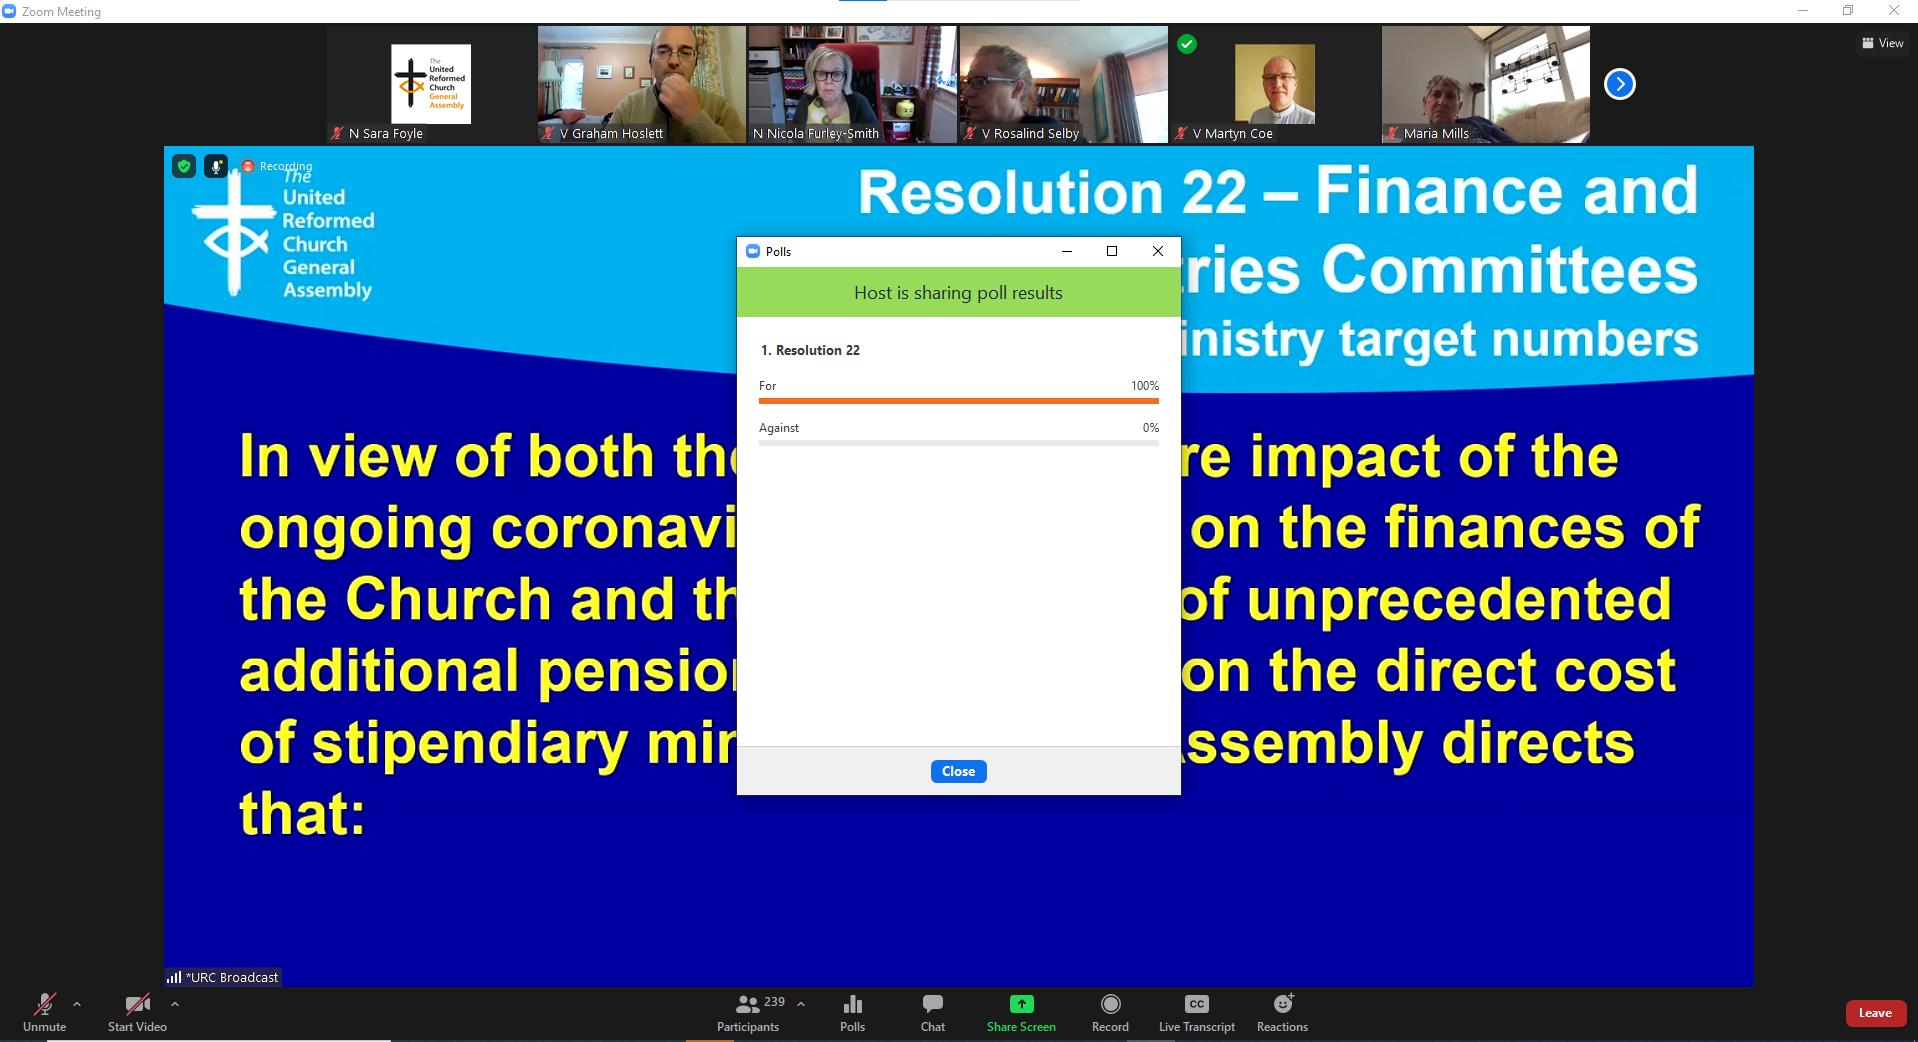 Res 22 passed